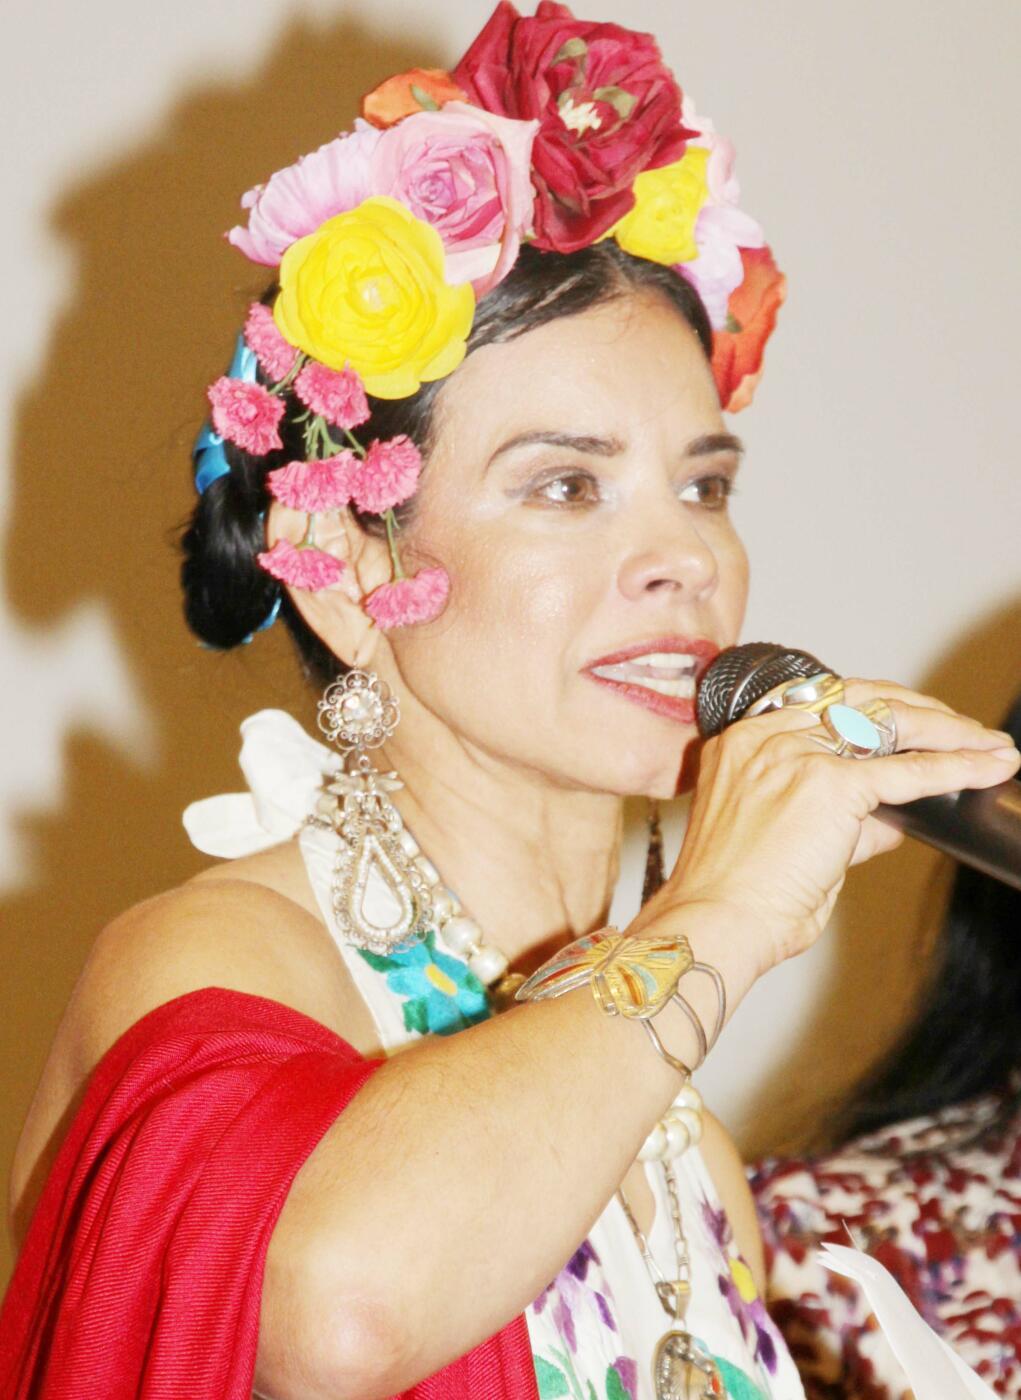 Christine Neumann-Ortiz